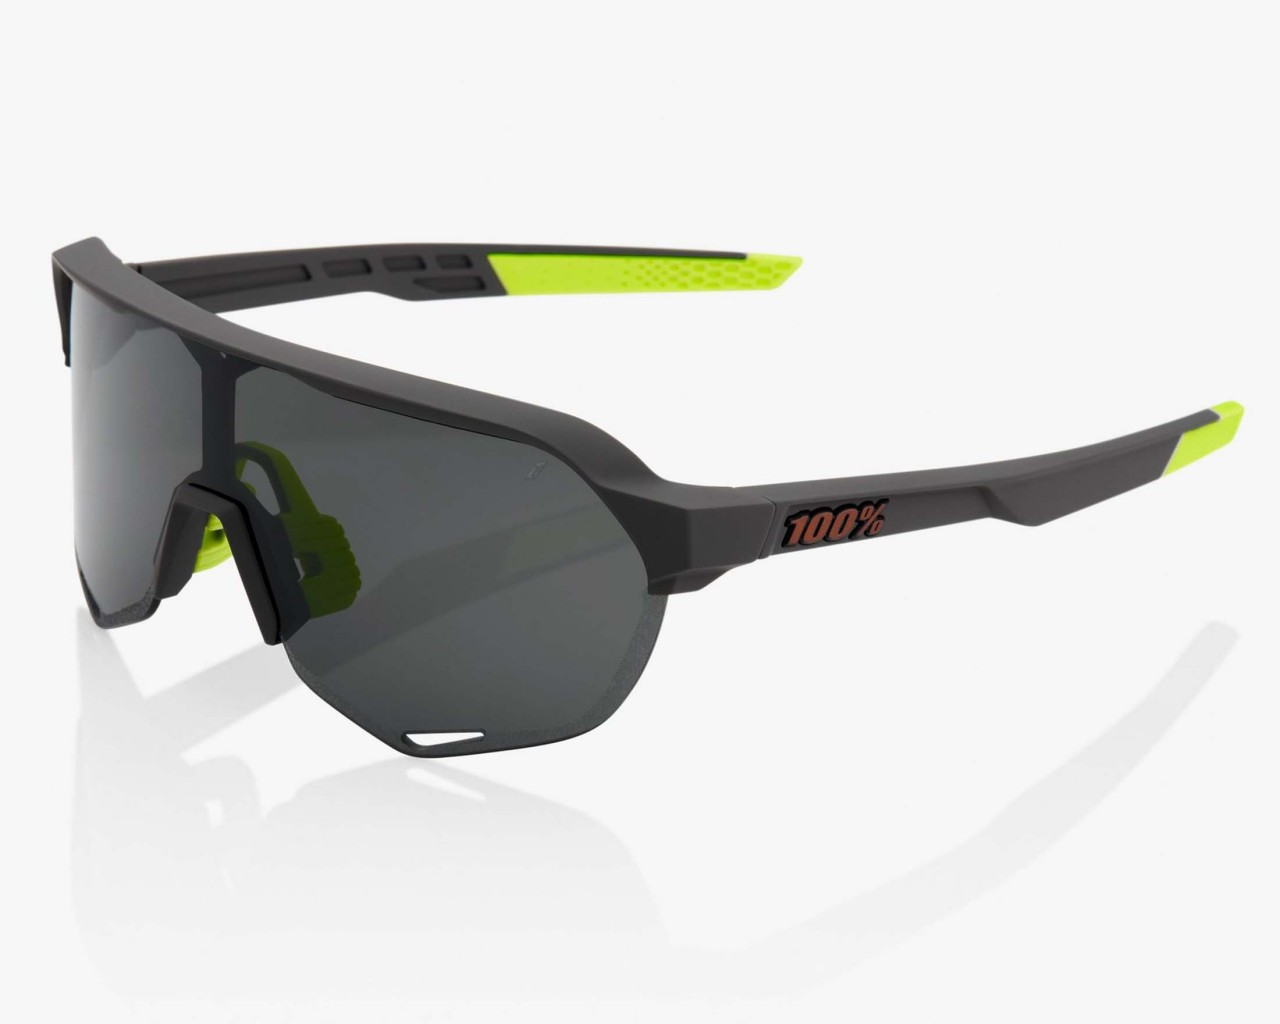 100% S2 - Smoke Lens Sports Sunglasses | soft tact cool grey